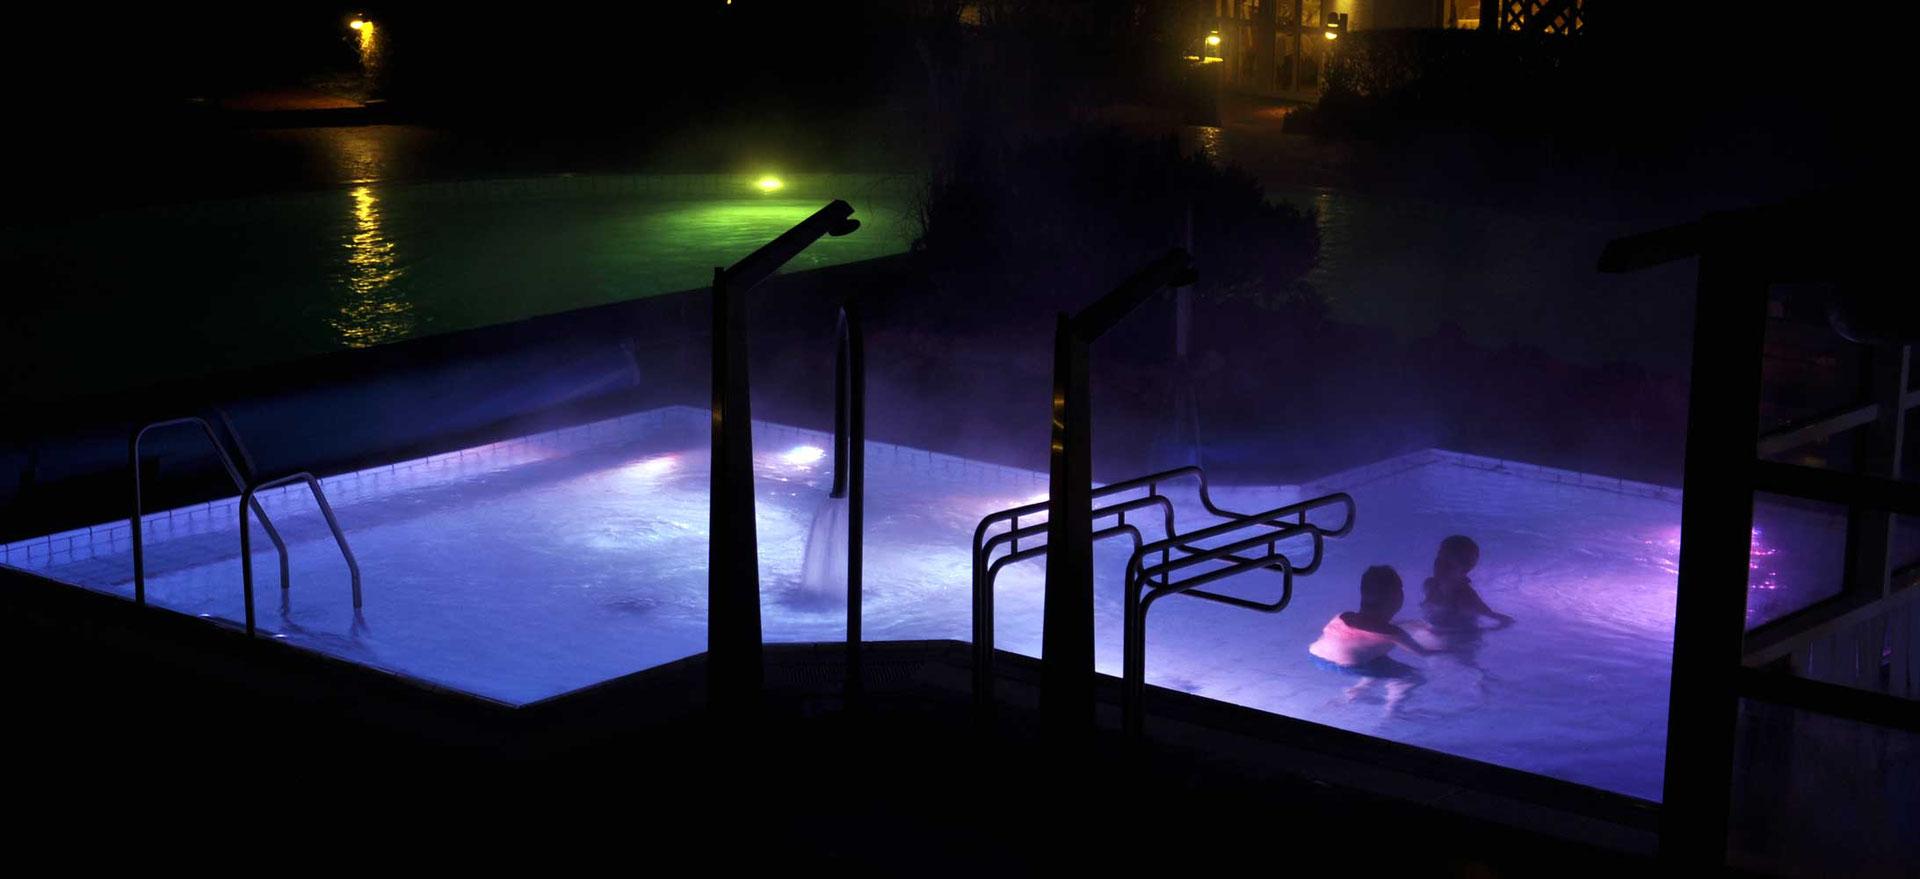 pool profi24 ihr fachhandel f r schwimmbadtechnik pool. Black Bedroom Furniture Sets. Home Design Ideas